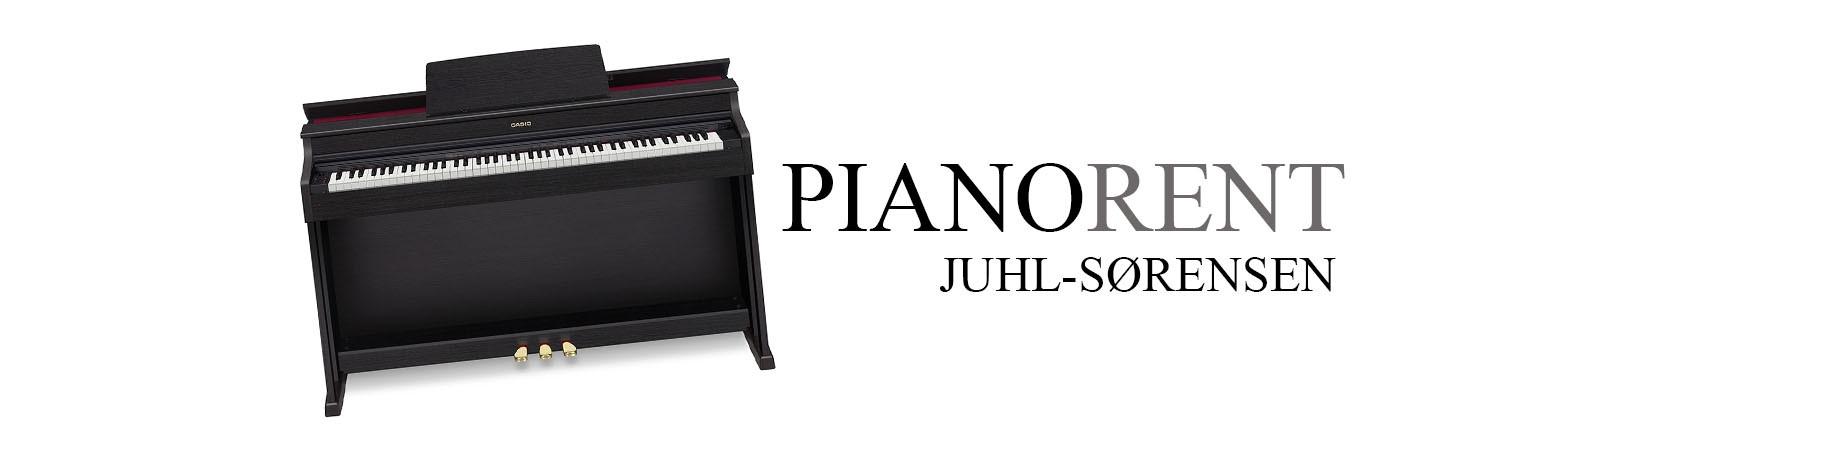 Pianorent.se - Hyr ditt piano hos oss!